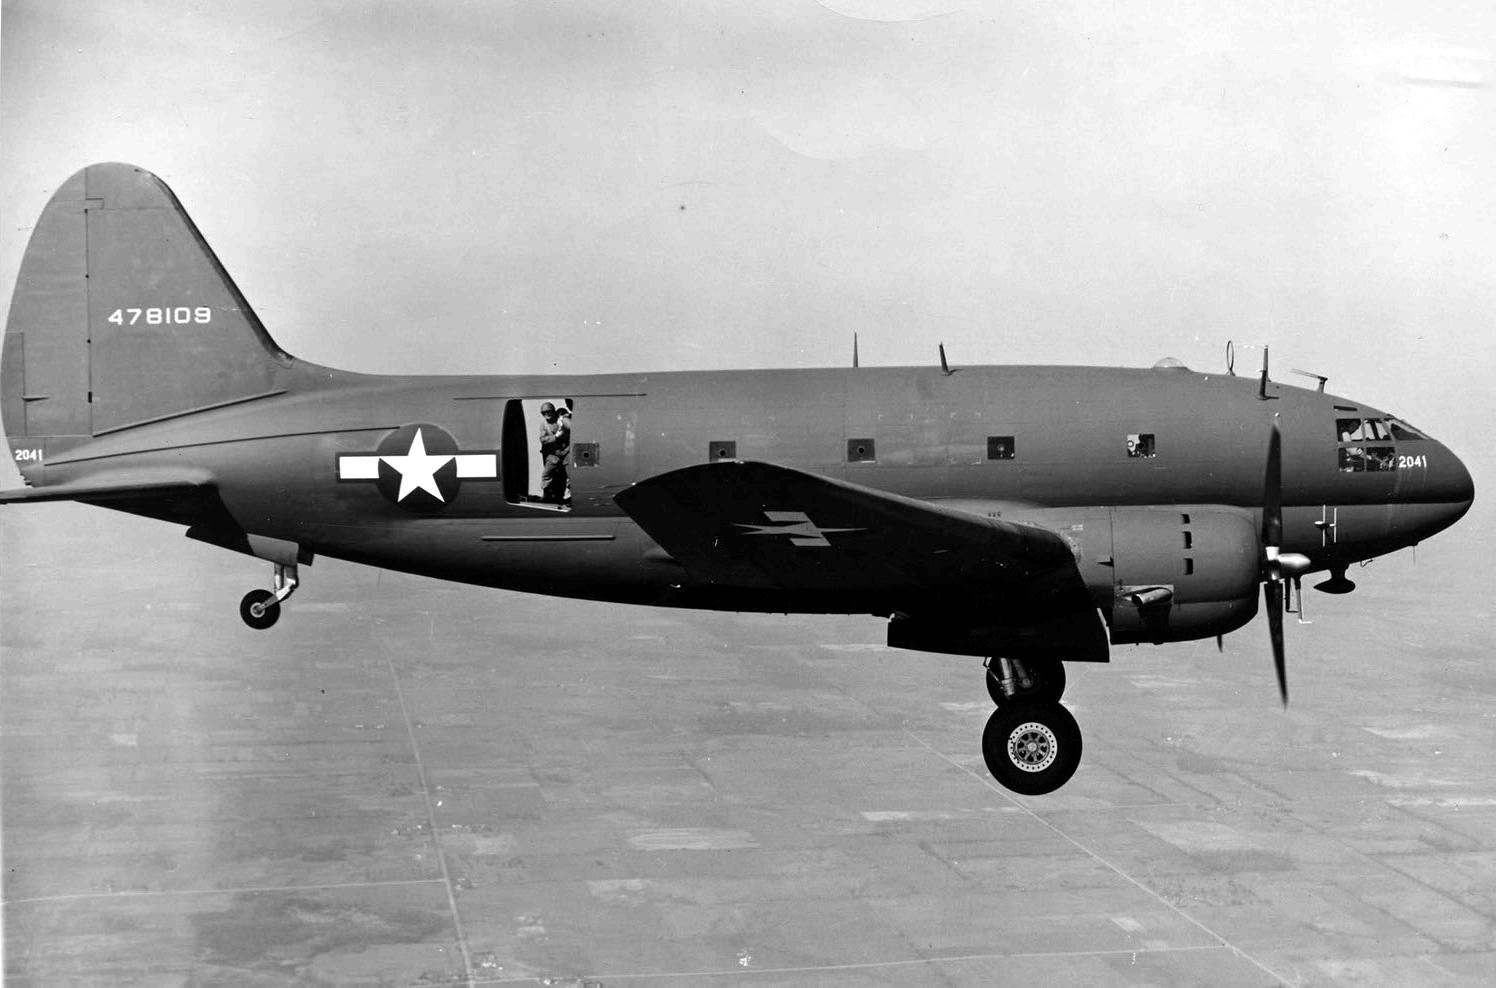 curtiss c46 commando 08 - Un Curtiss C-46 Commando en vol